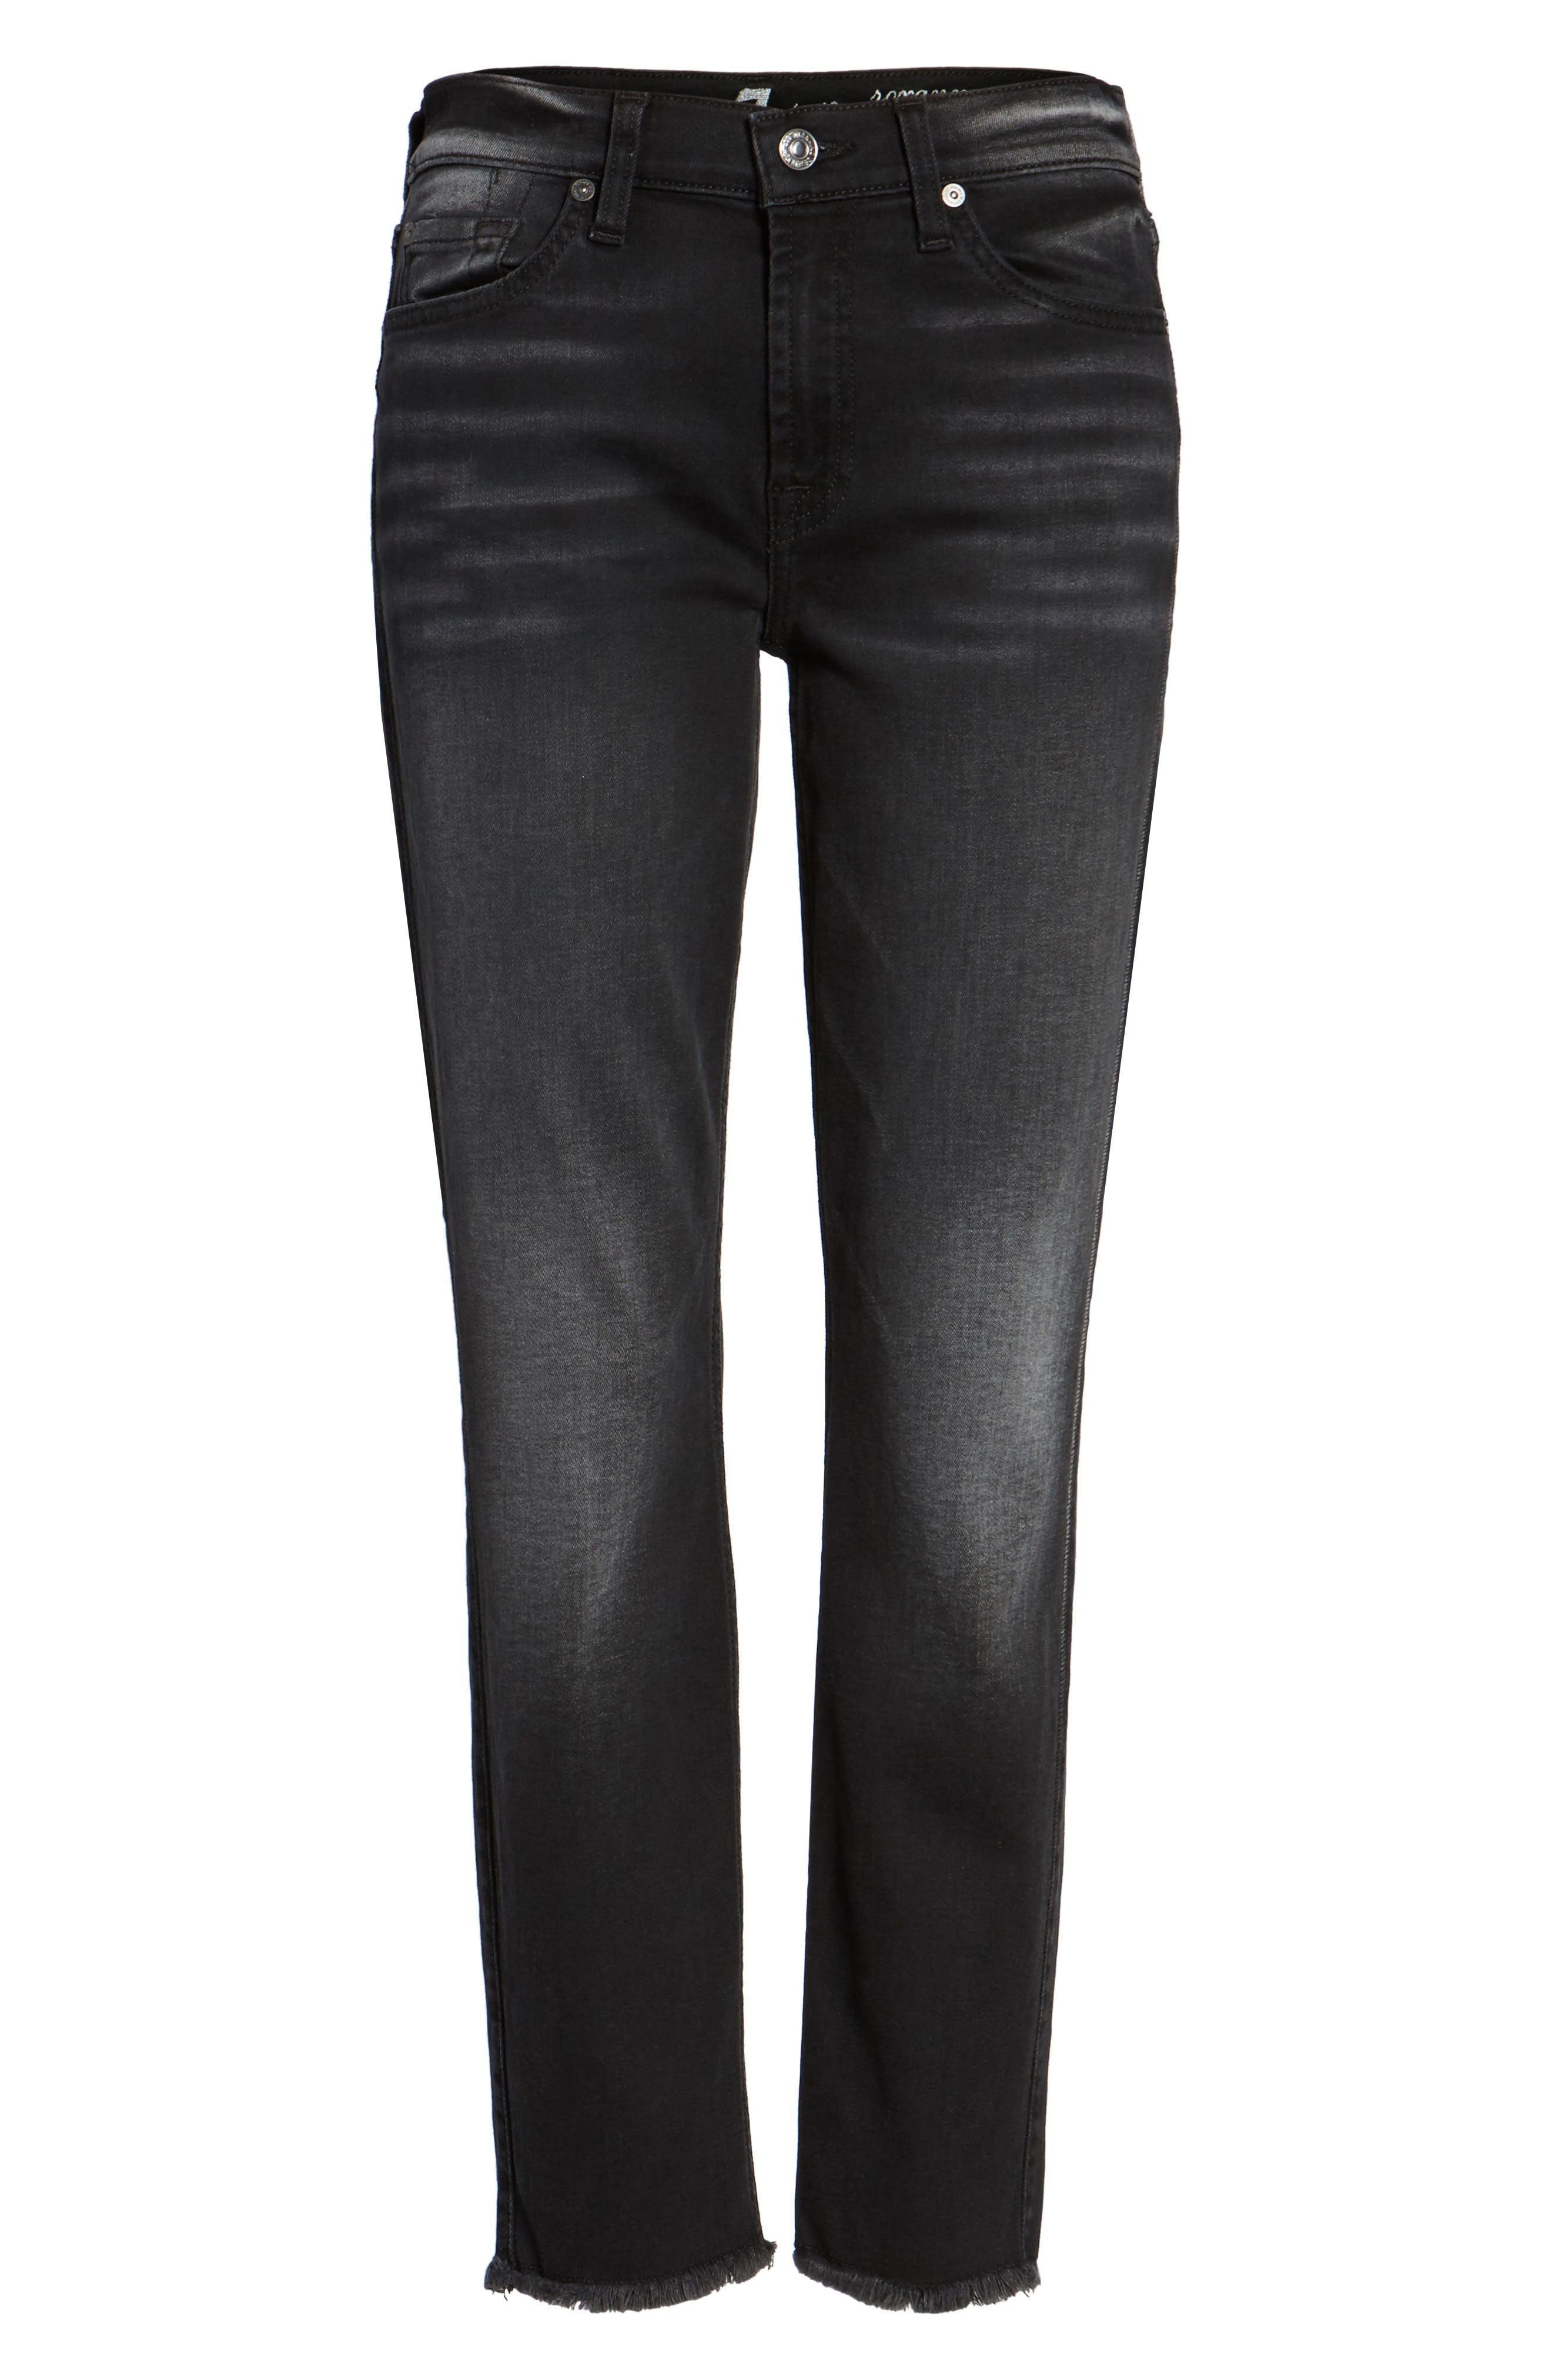 Seven7 Roxanne Raw Hem Ankle Jeans,                             Alternate thumbnail 6, color,                             004